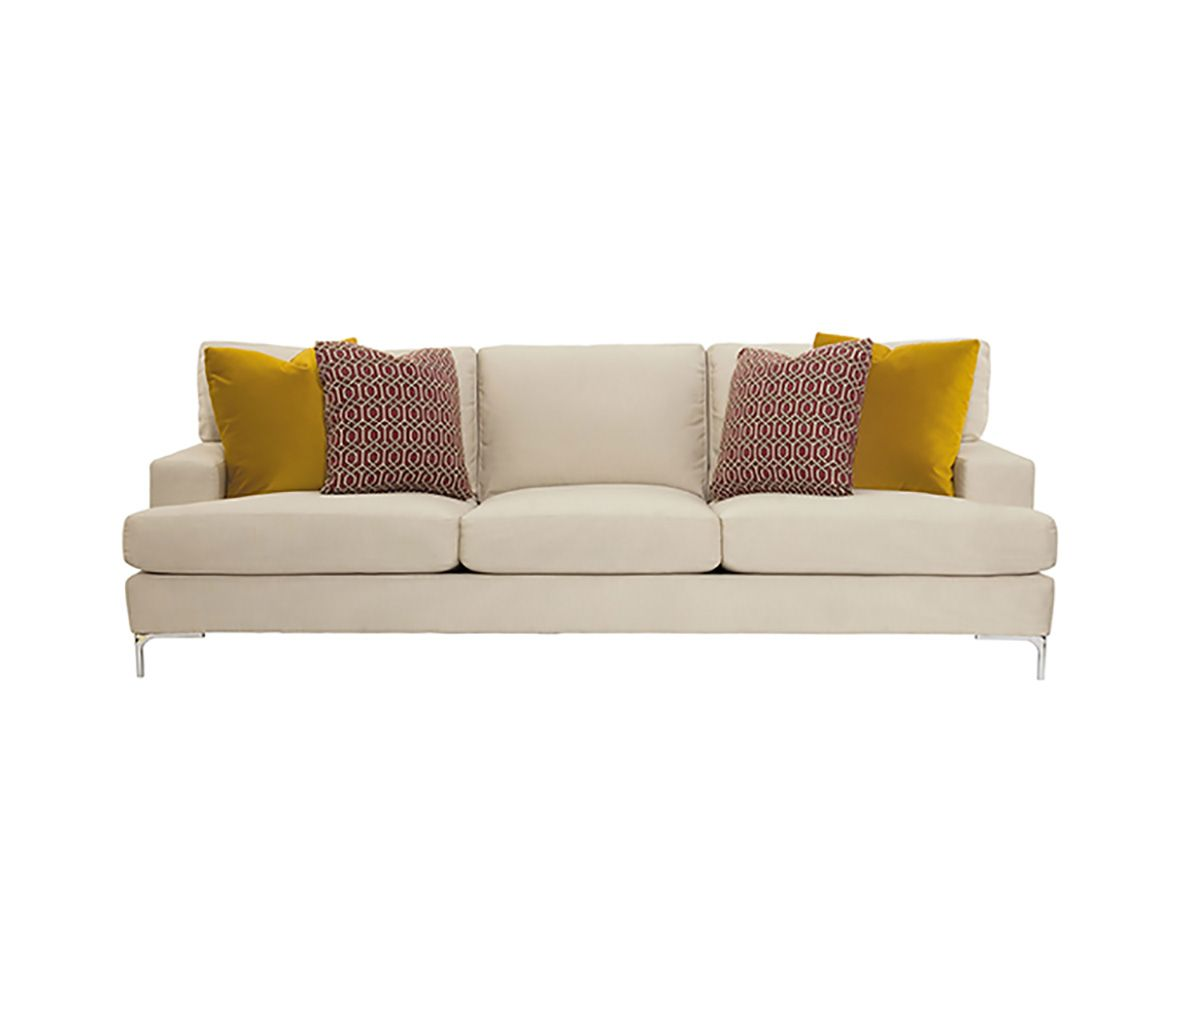 Bernhardt Carver Sofa Set Collier 39 S Furniture Expo